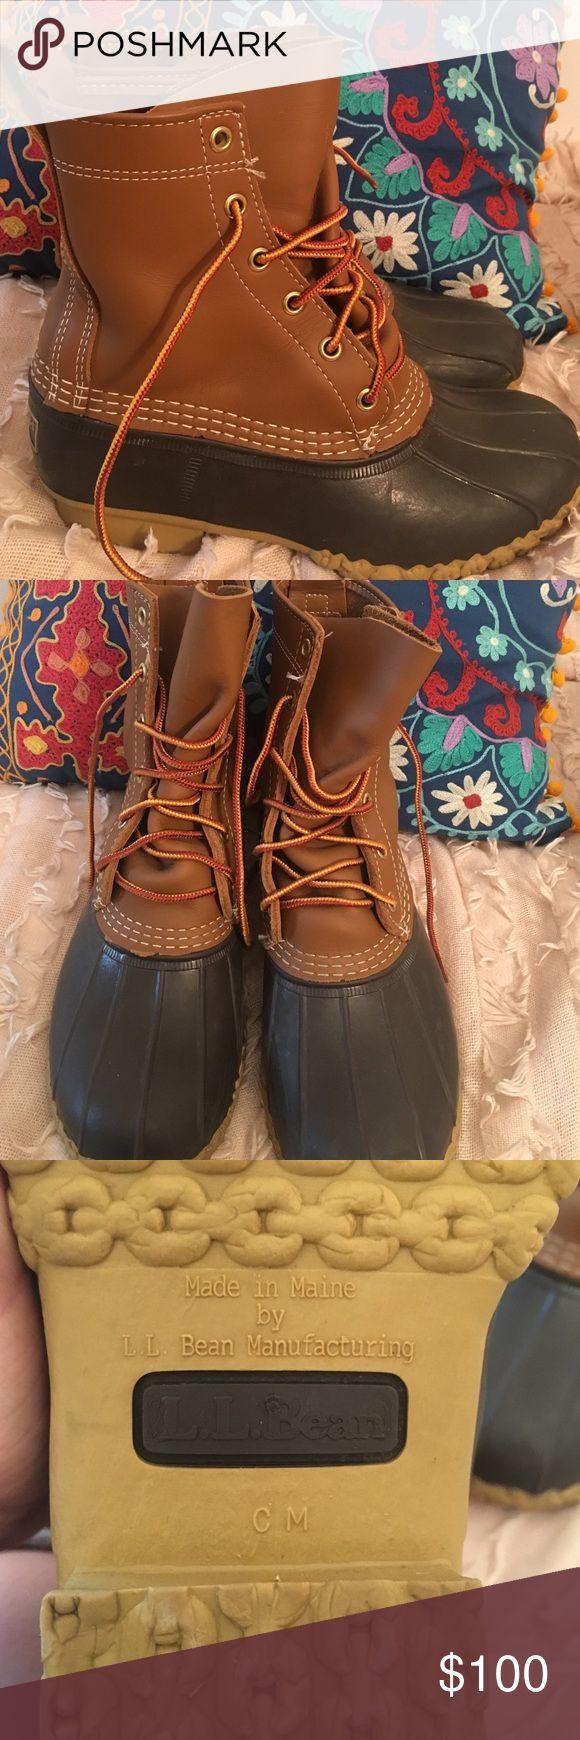 L.L Bean Boots Women's L.L bean boots womens! Never been worn. L.L. Bean Shoes Winter & Rain Boots